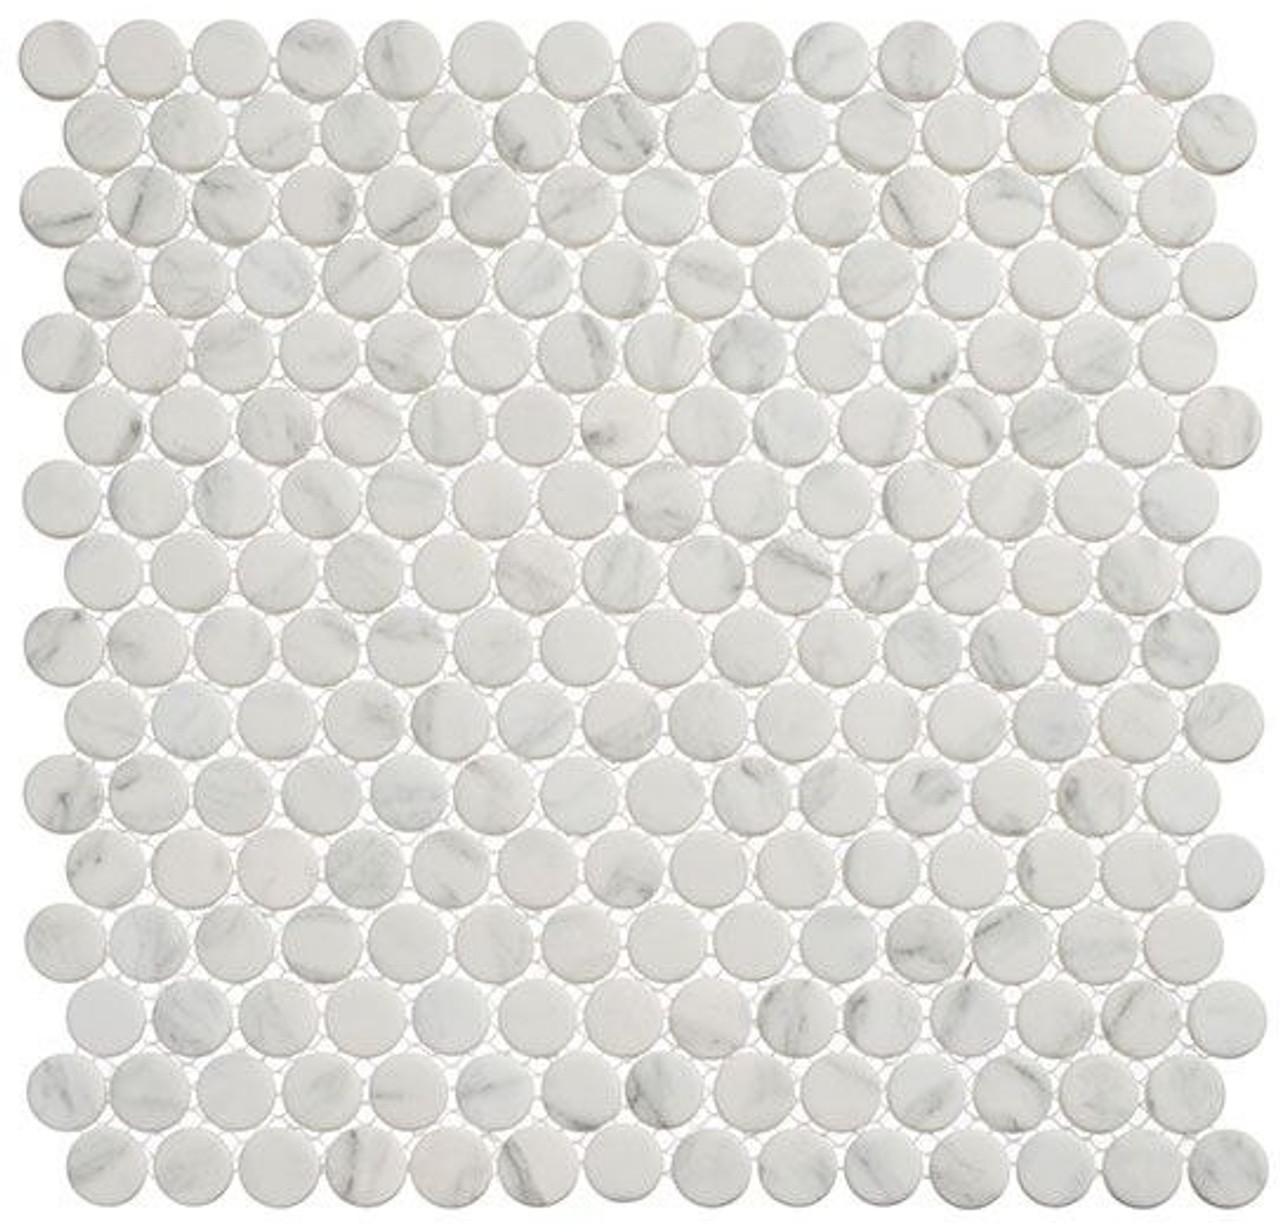 Bella Glass Tiles Polka Dots PLK61 Jasmine Delight